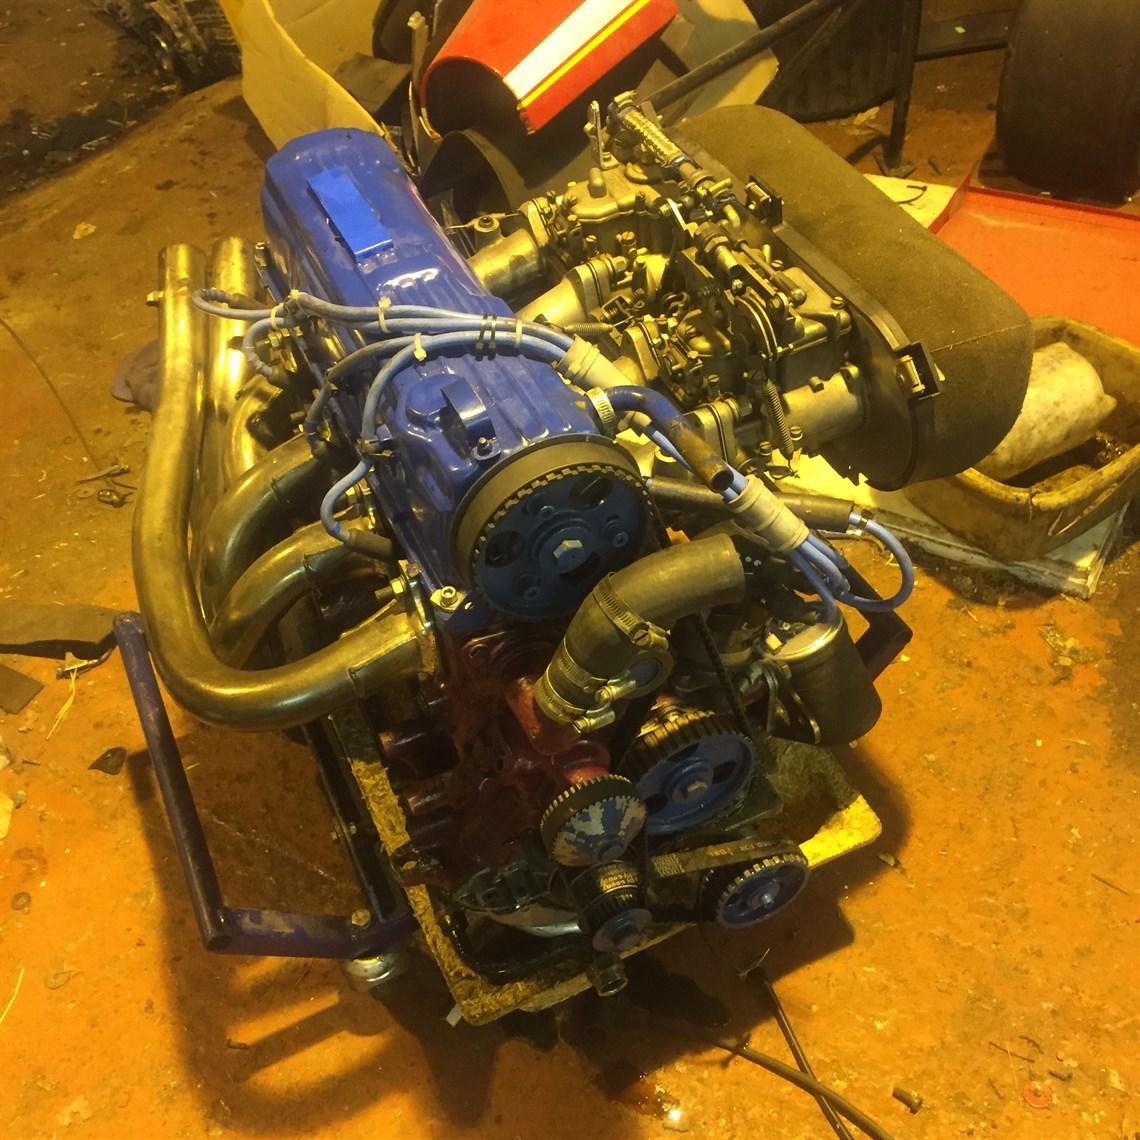 Racecarsdirect com - Dry sump FORD PINTO race/hillclimb engine